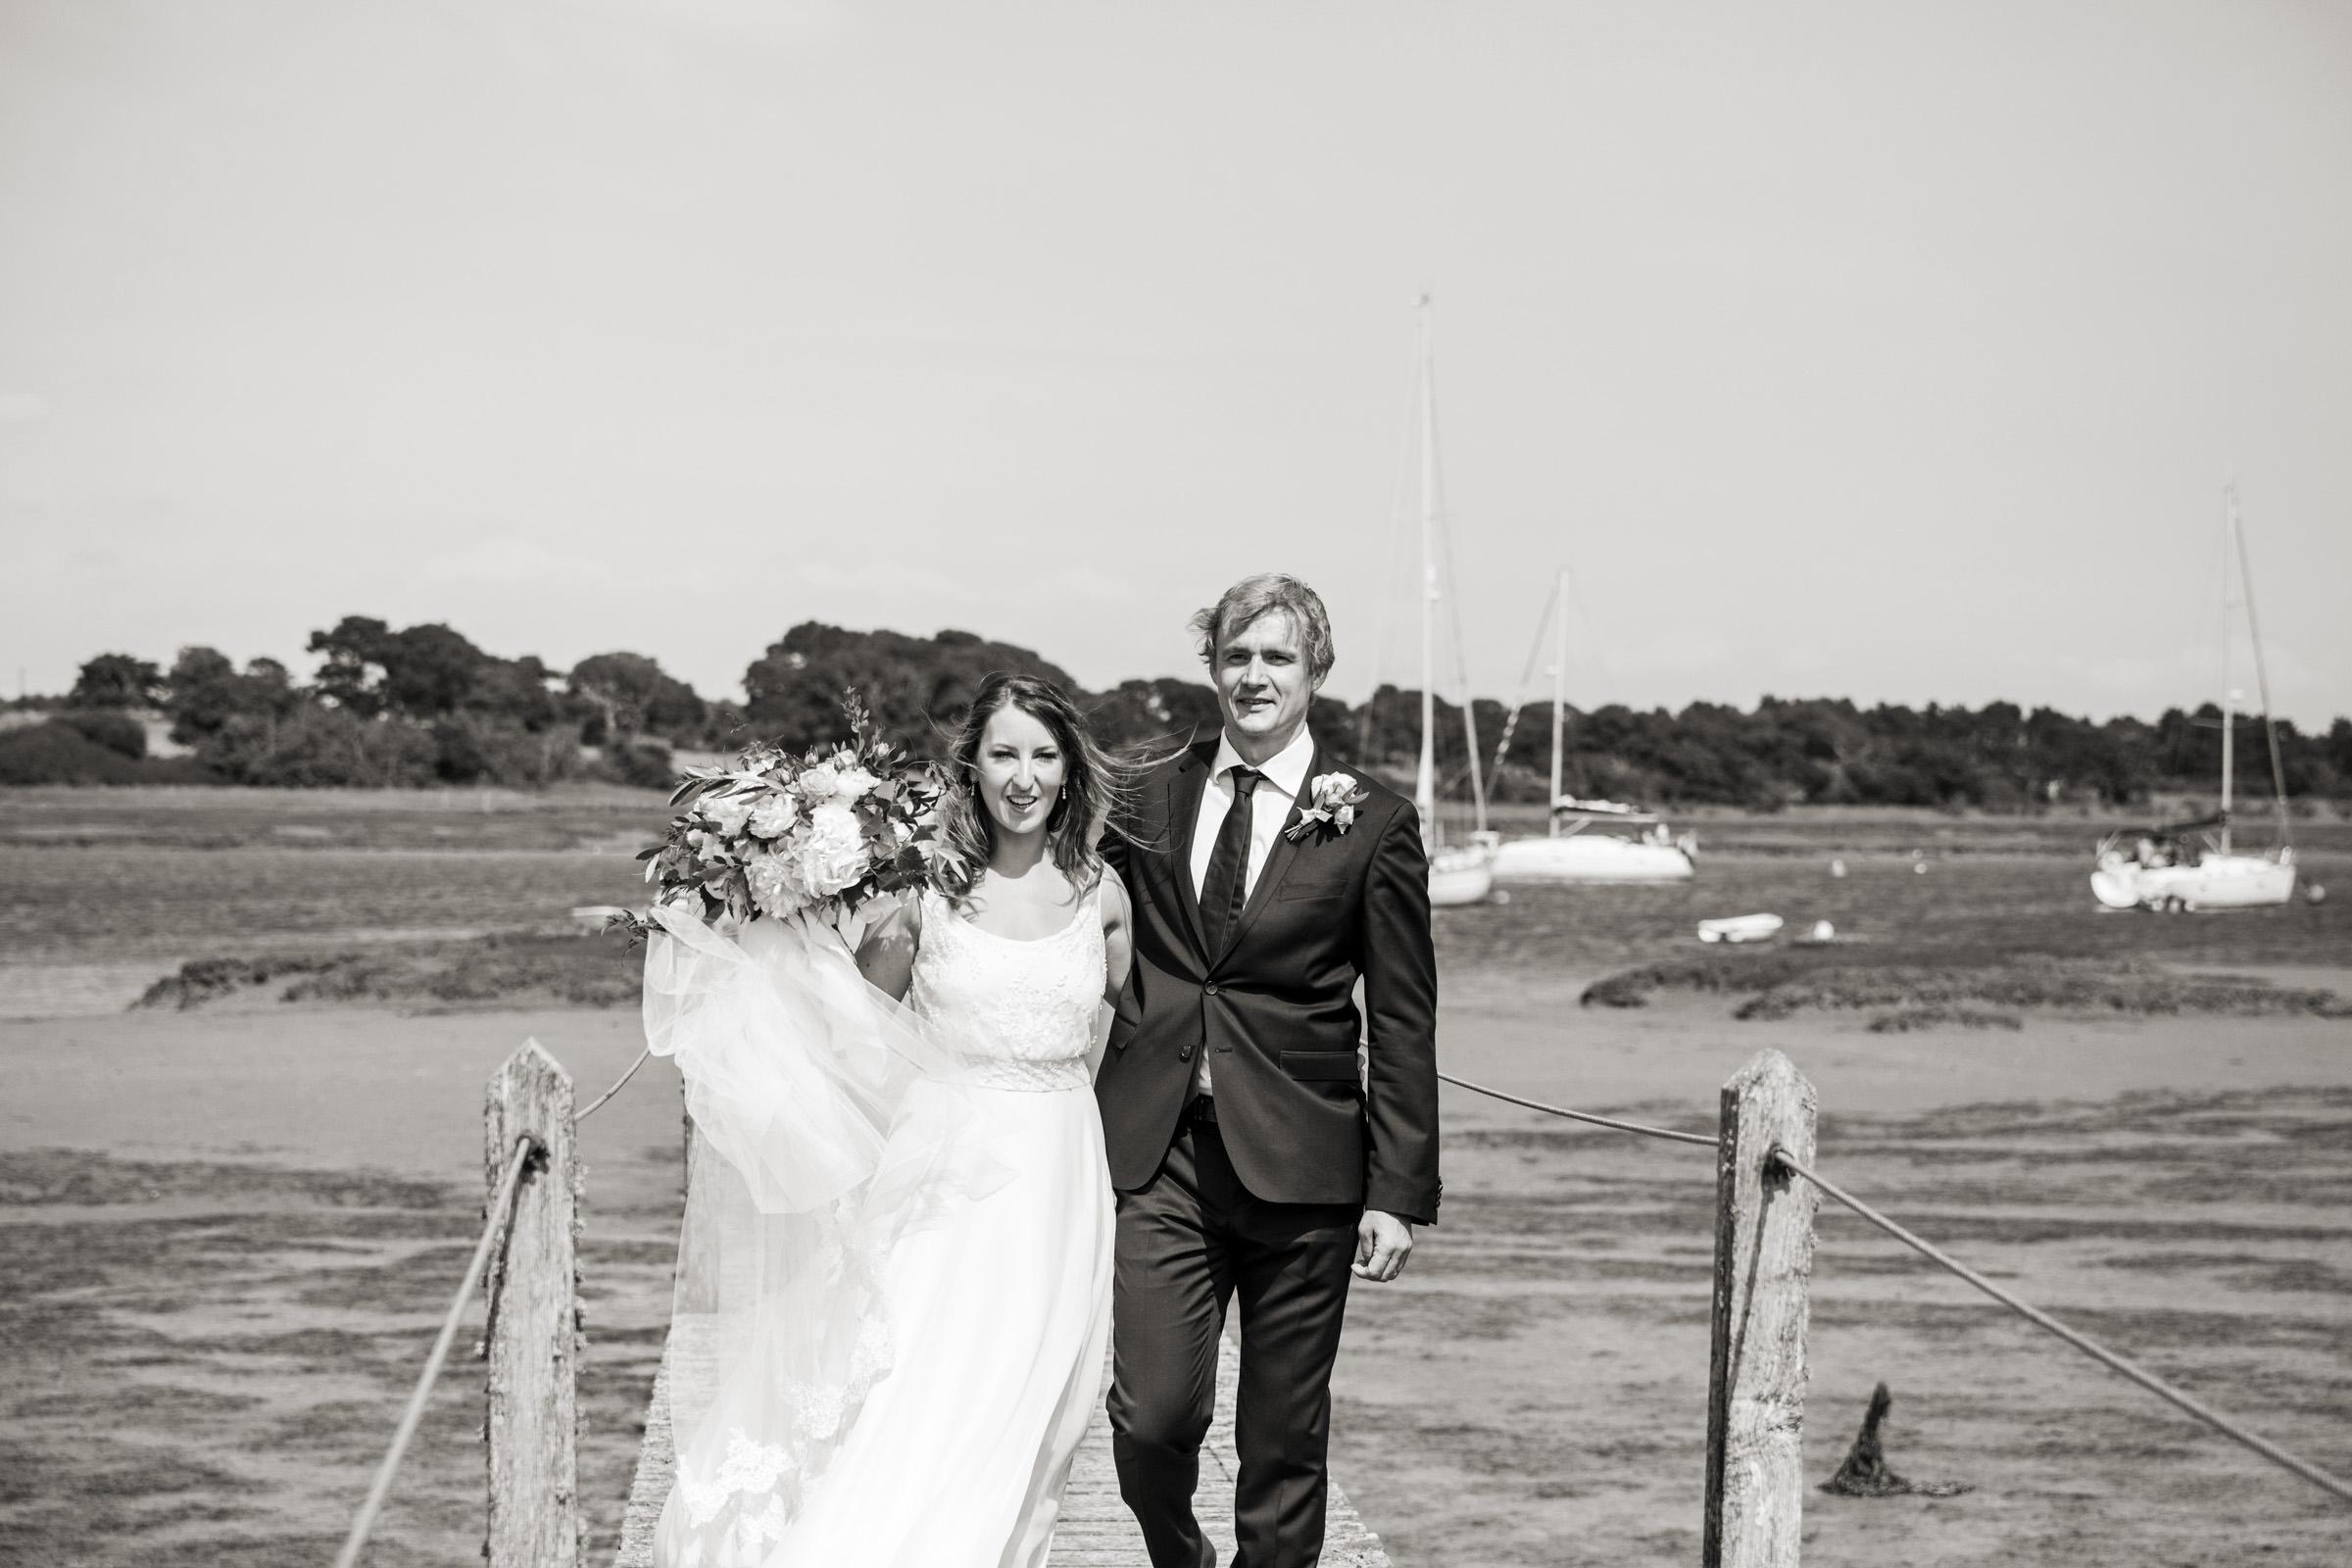 wedding photography at Gins Barn 026.jpg